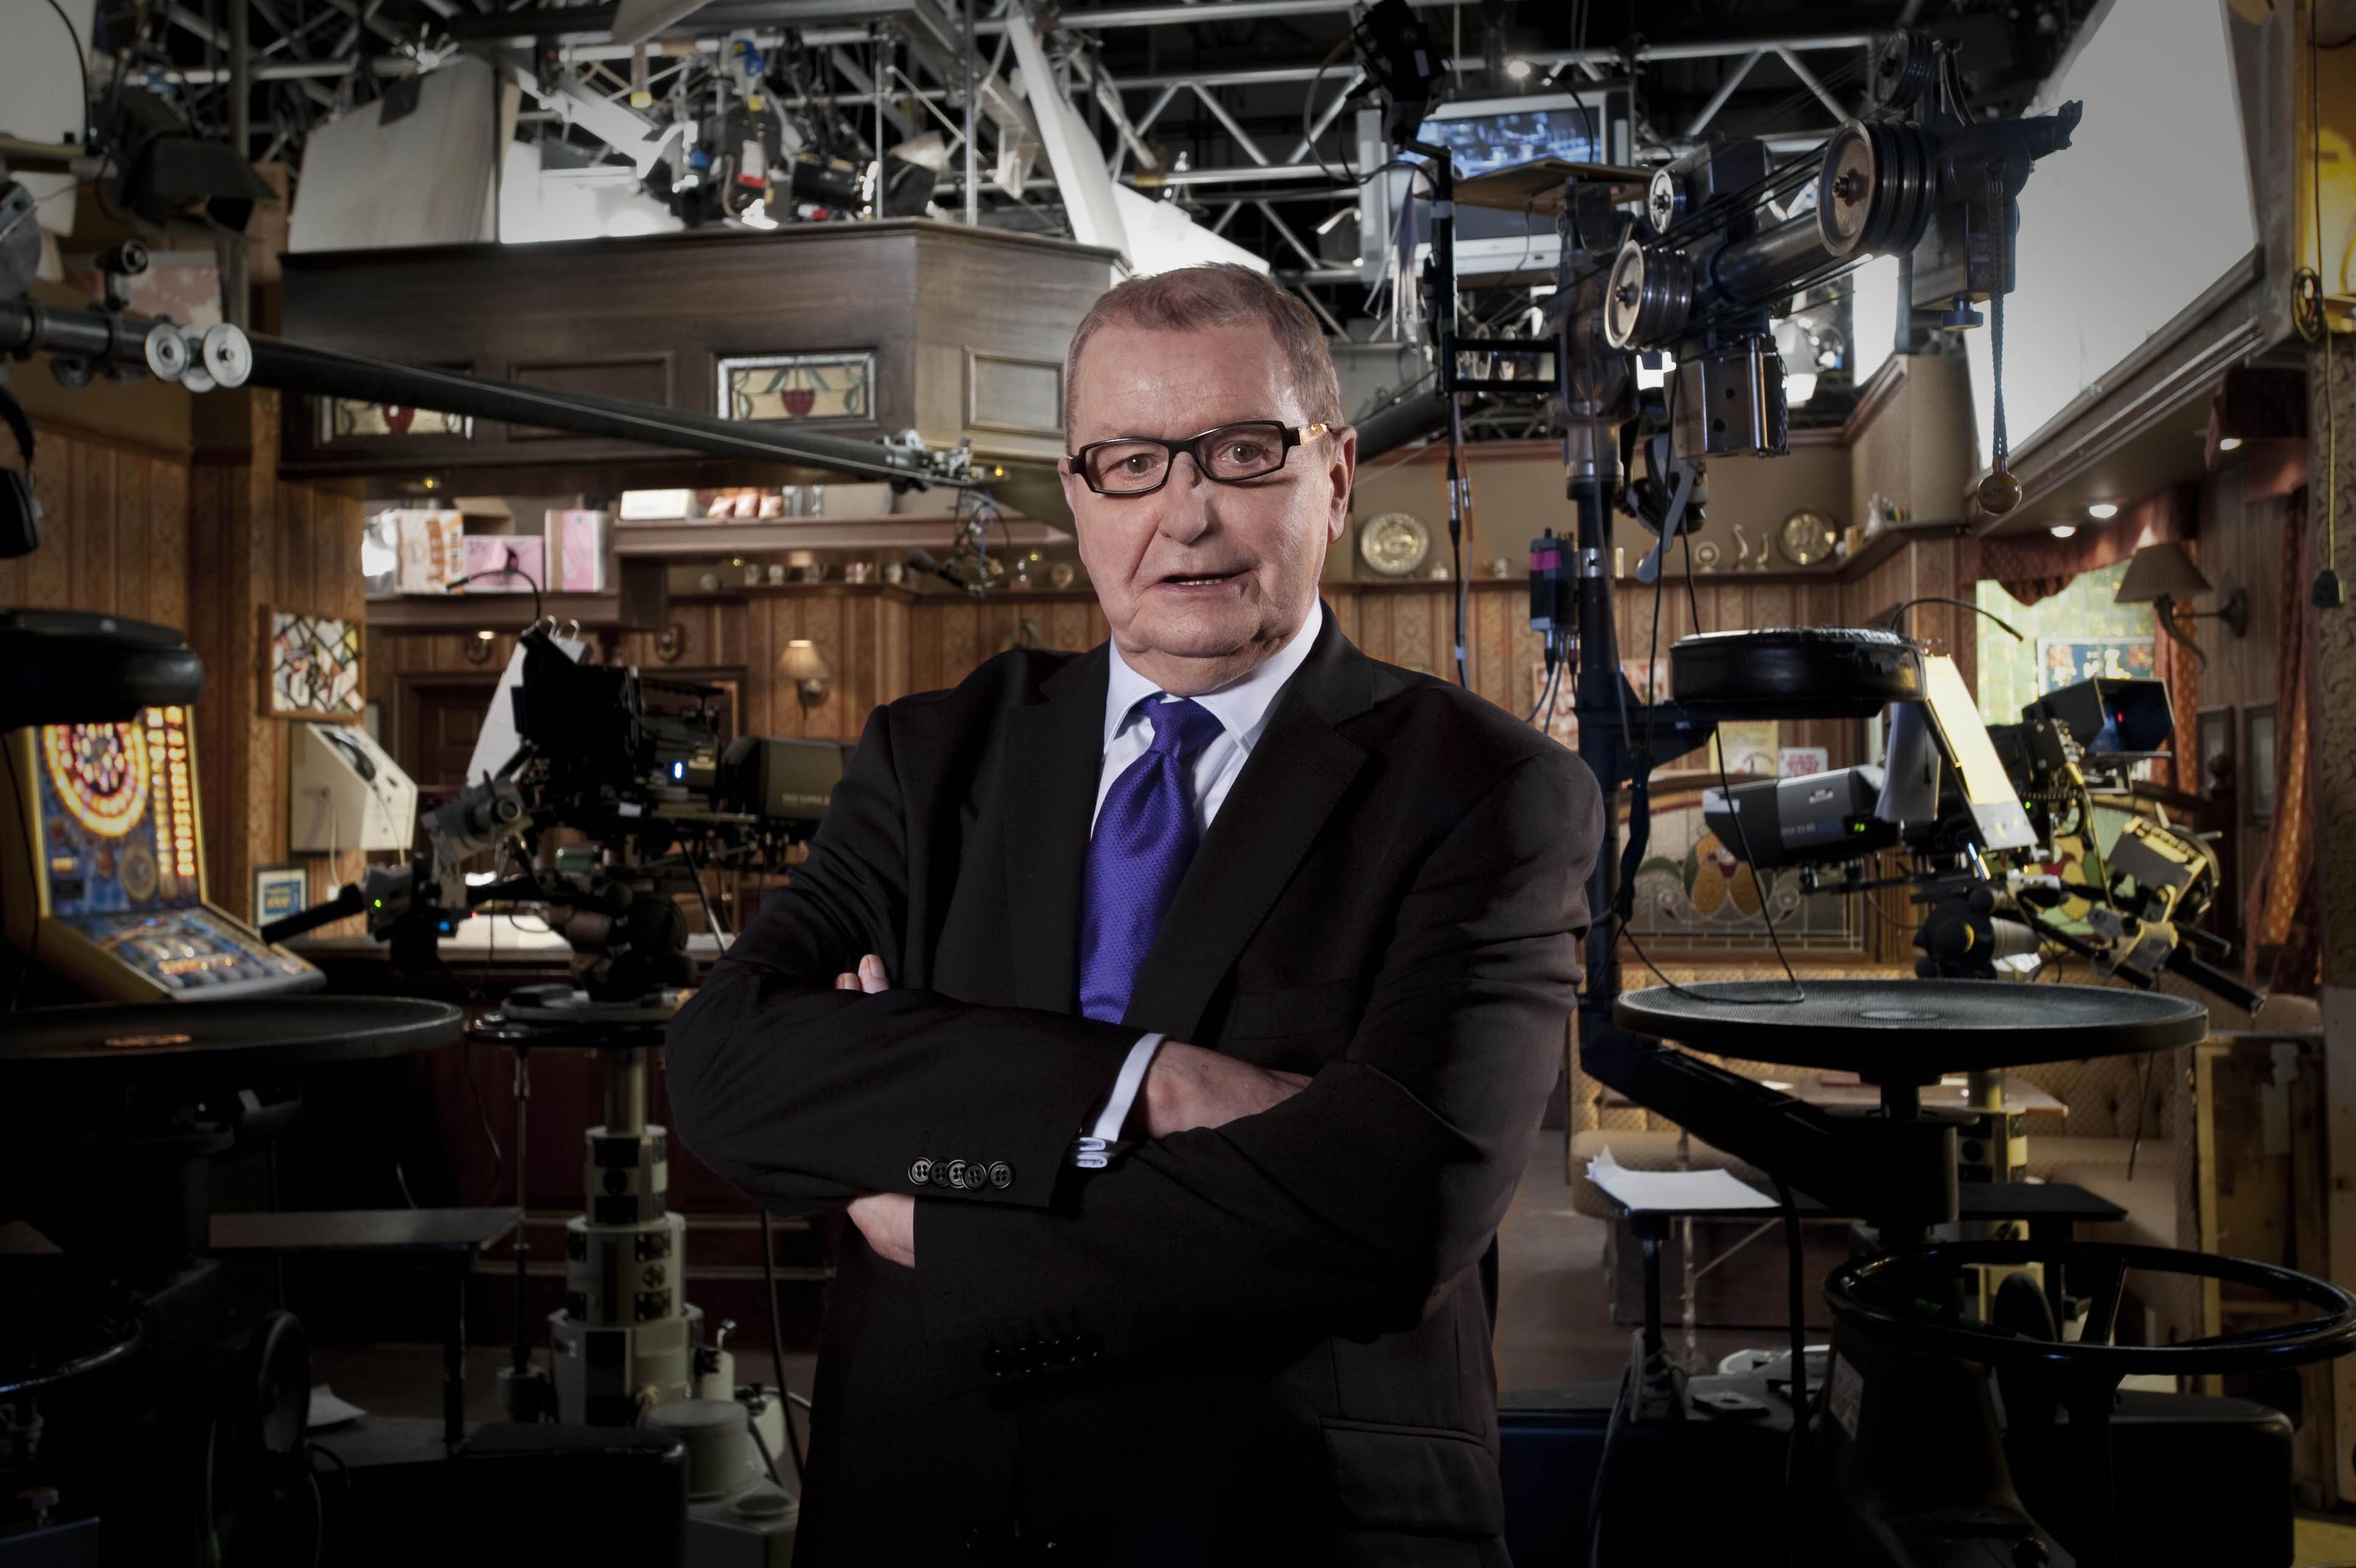 Coronation Street creator and writer Tony Warren on set (ITV/PA Wire)